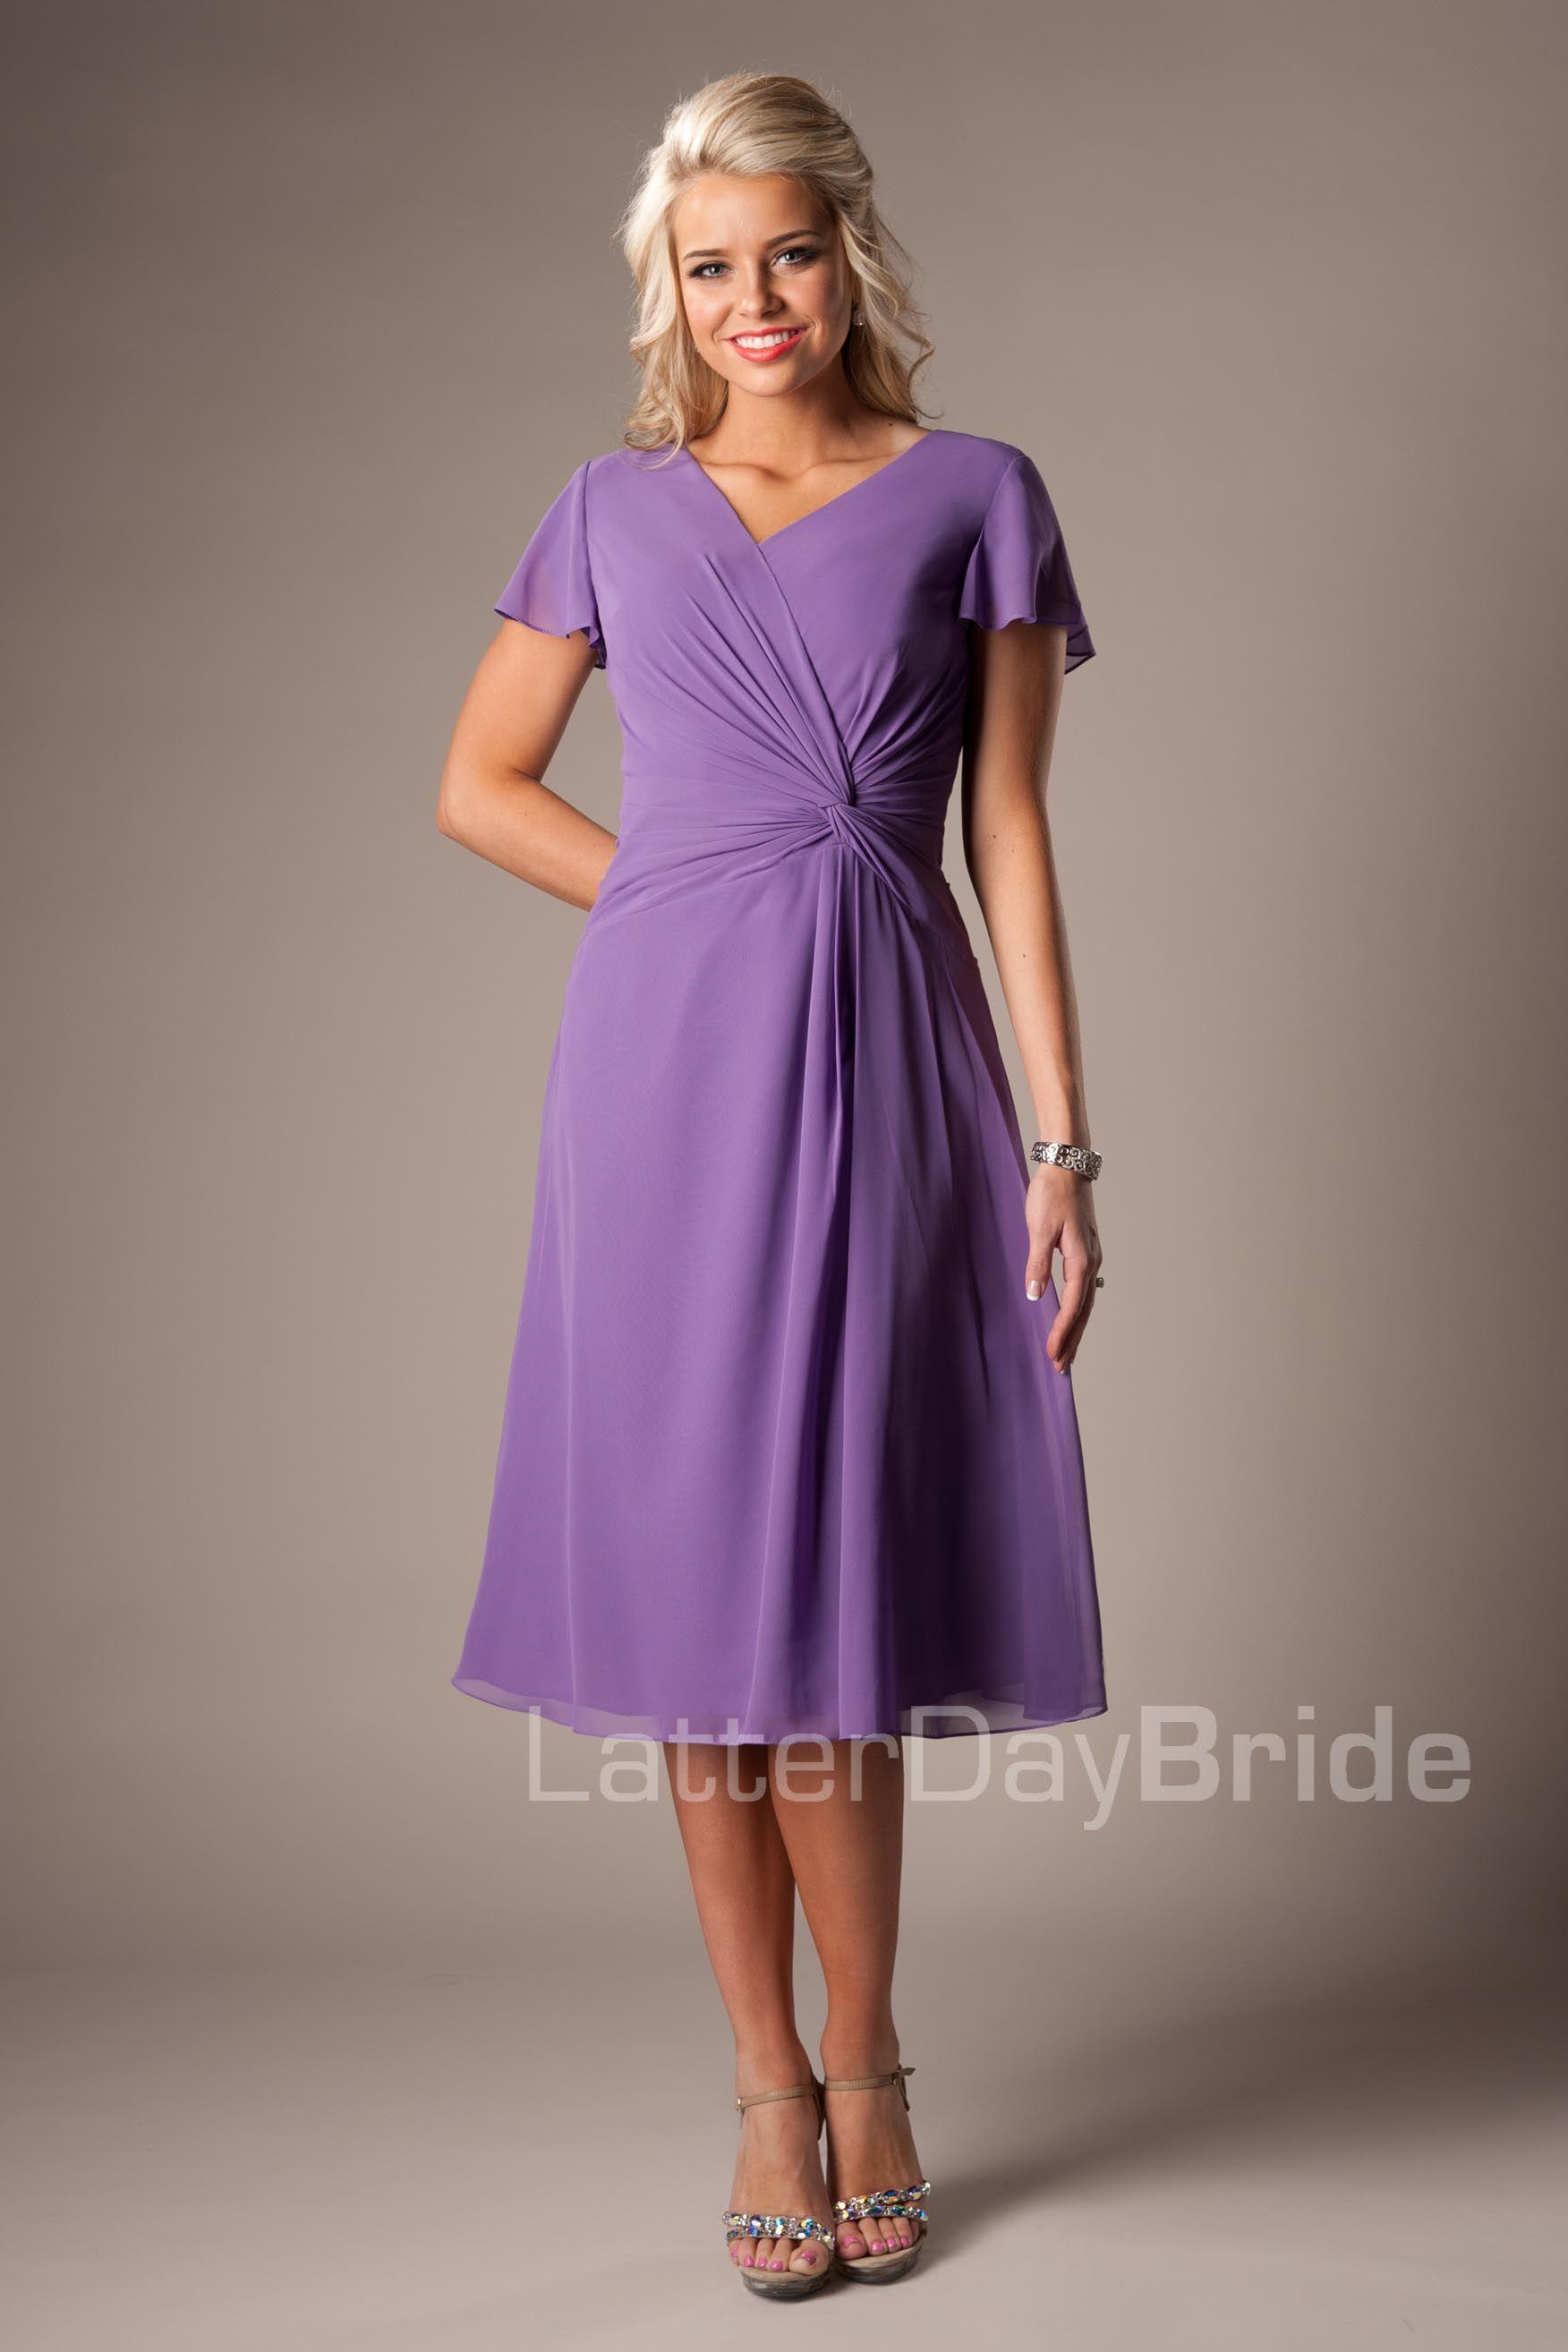 Modest Bridesmaid Dresses : Denise | wedding | Pinterest | Vestiditos